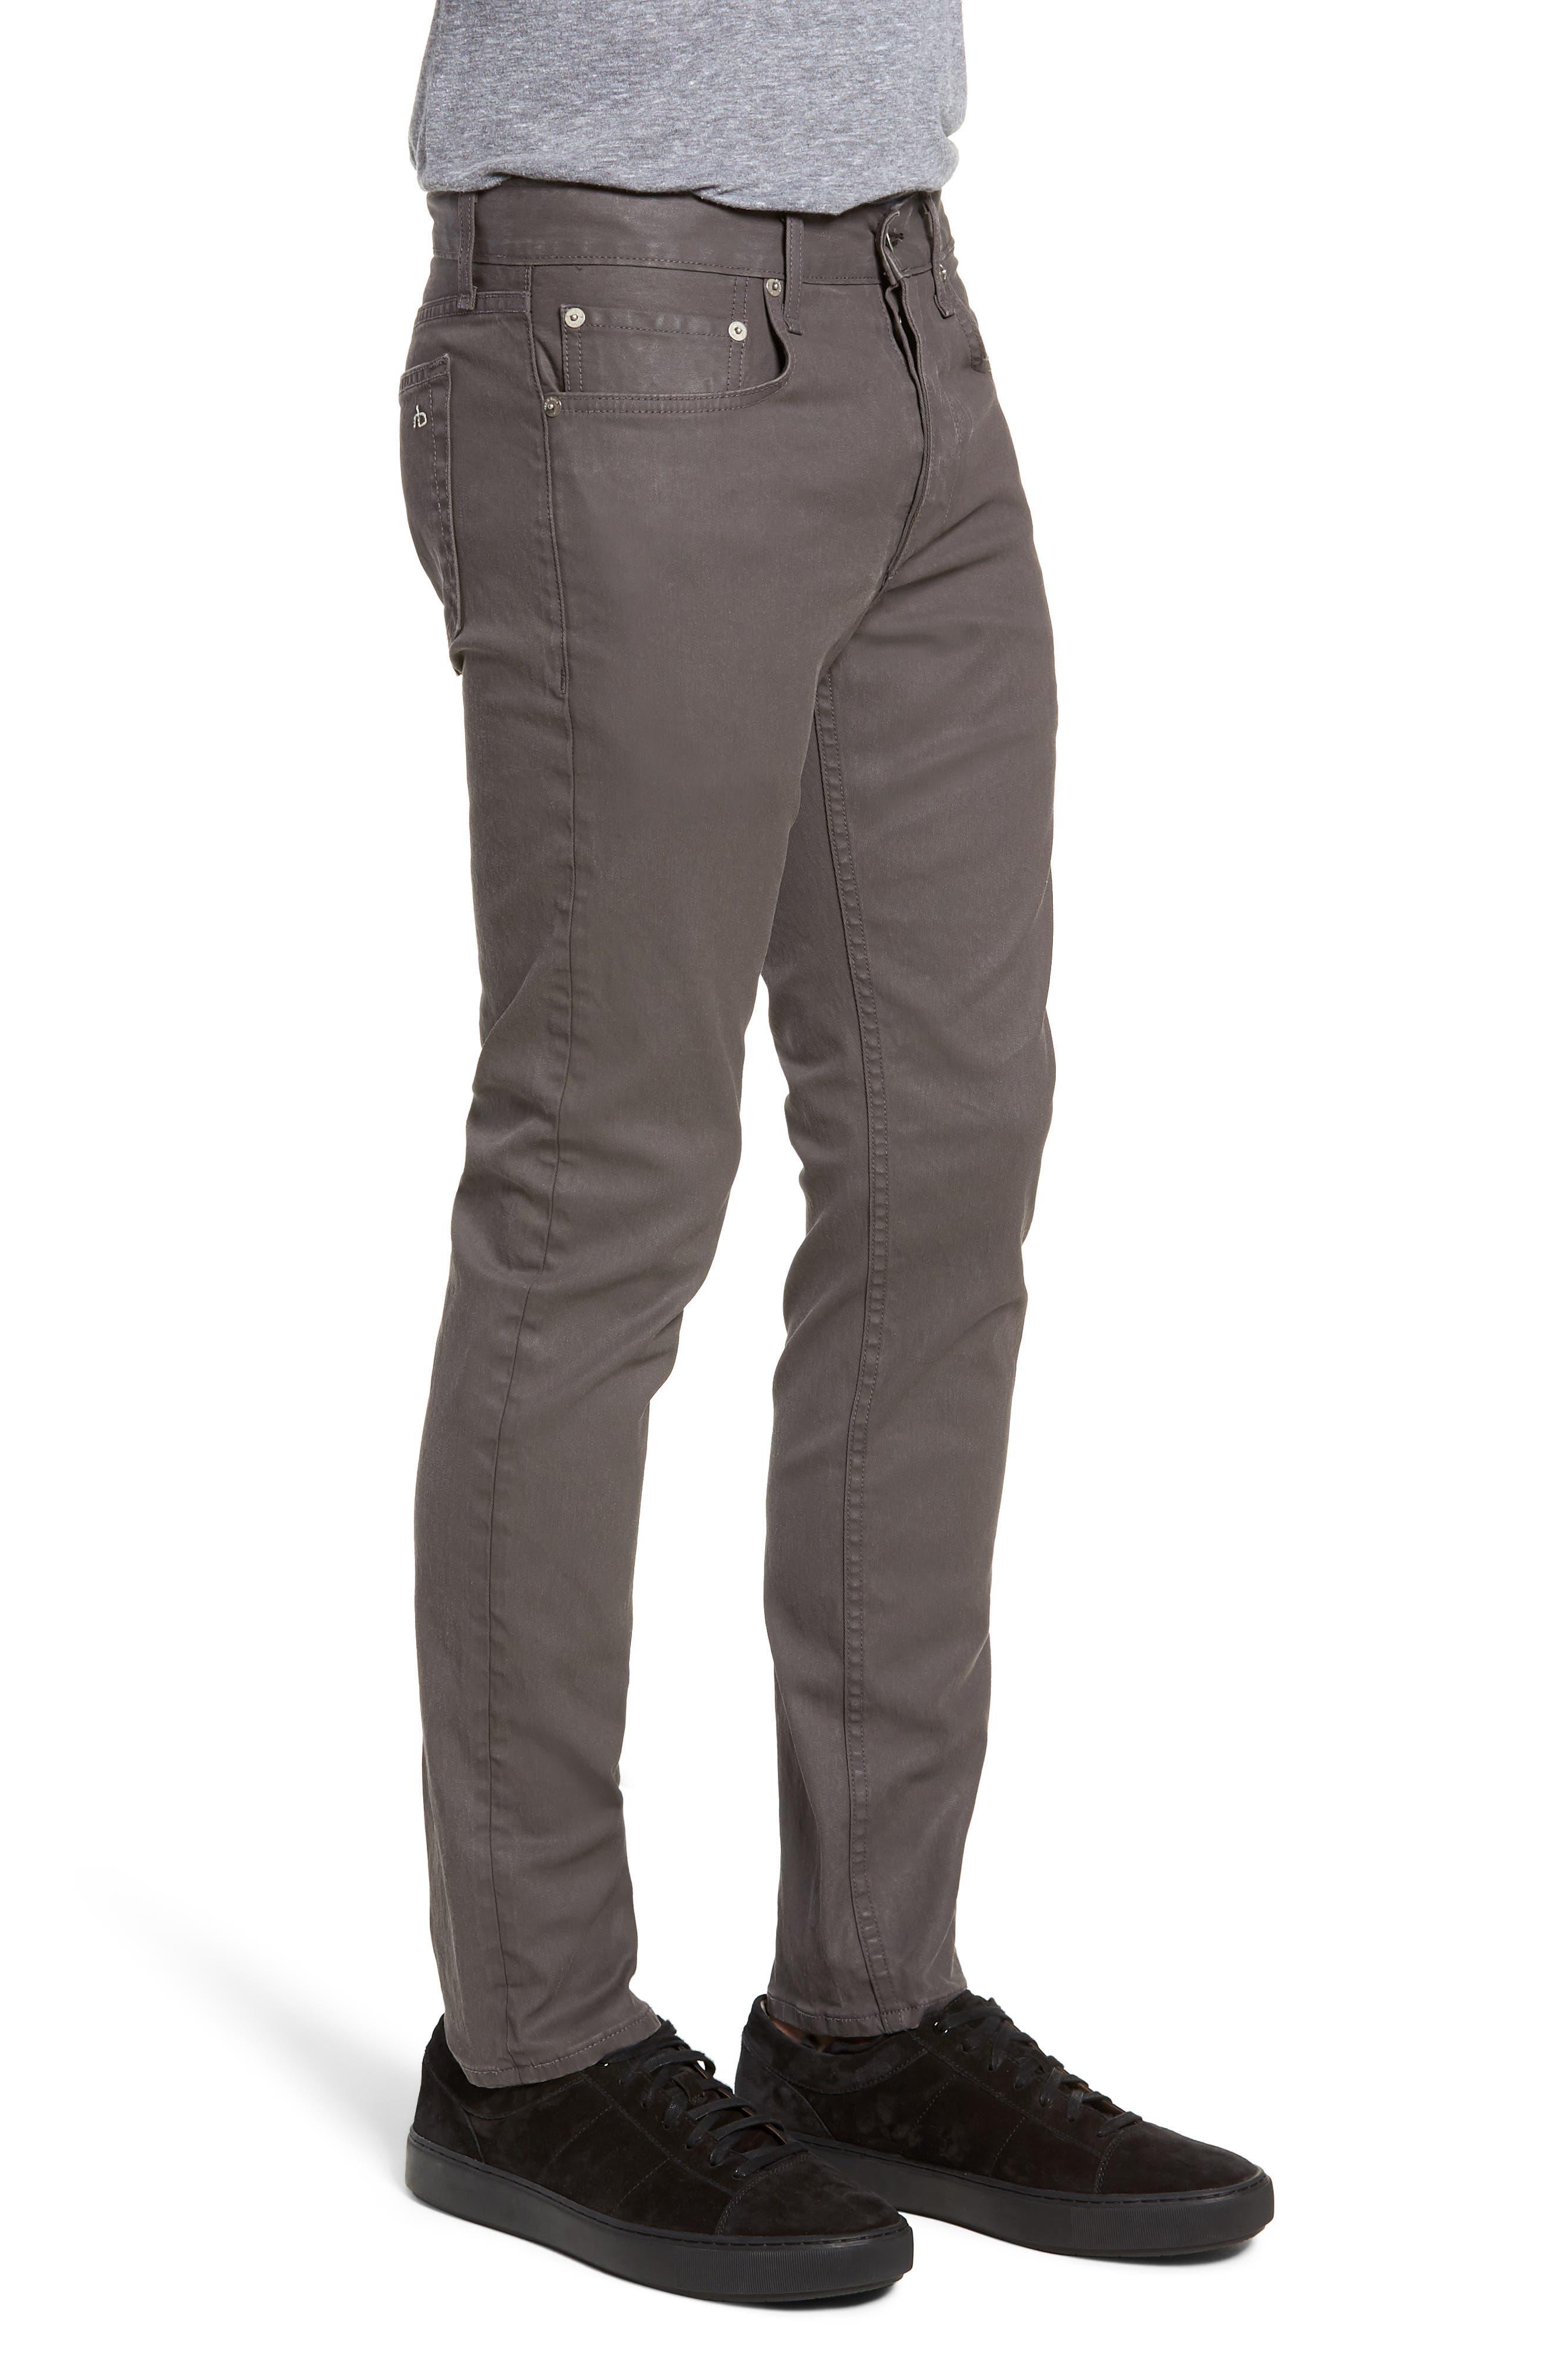 RAG & BONE, Fit 2 Slim Fit Pants, Alternate thumbnail 3, color, 020